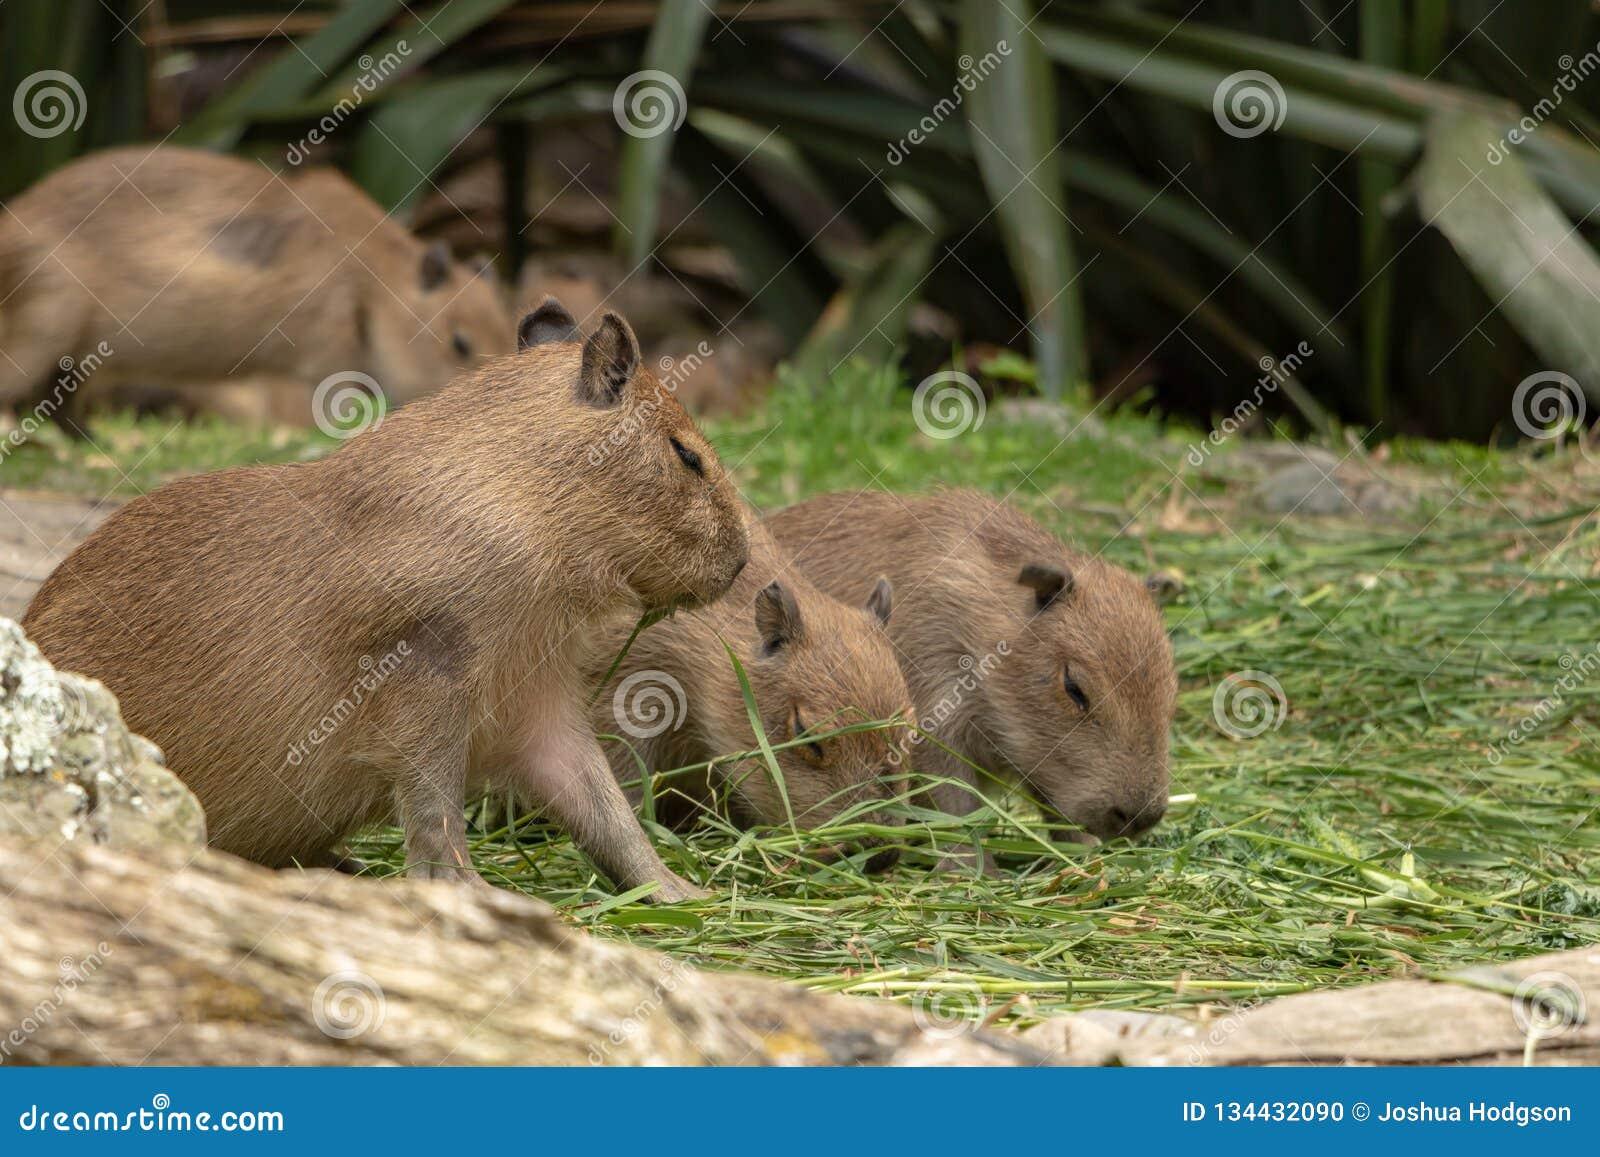 Capybara mignon de alimentation du bébé trois